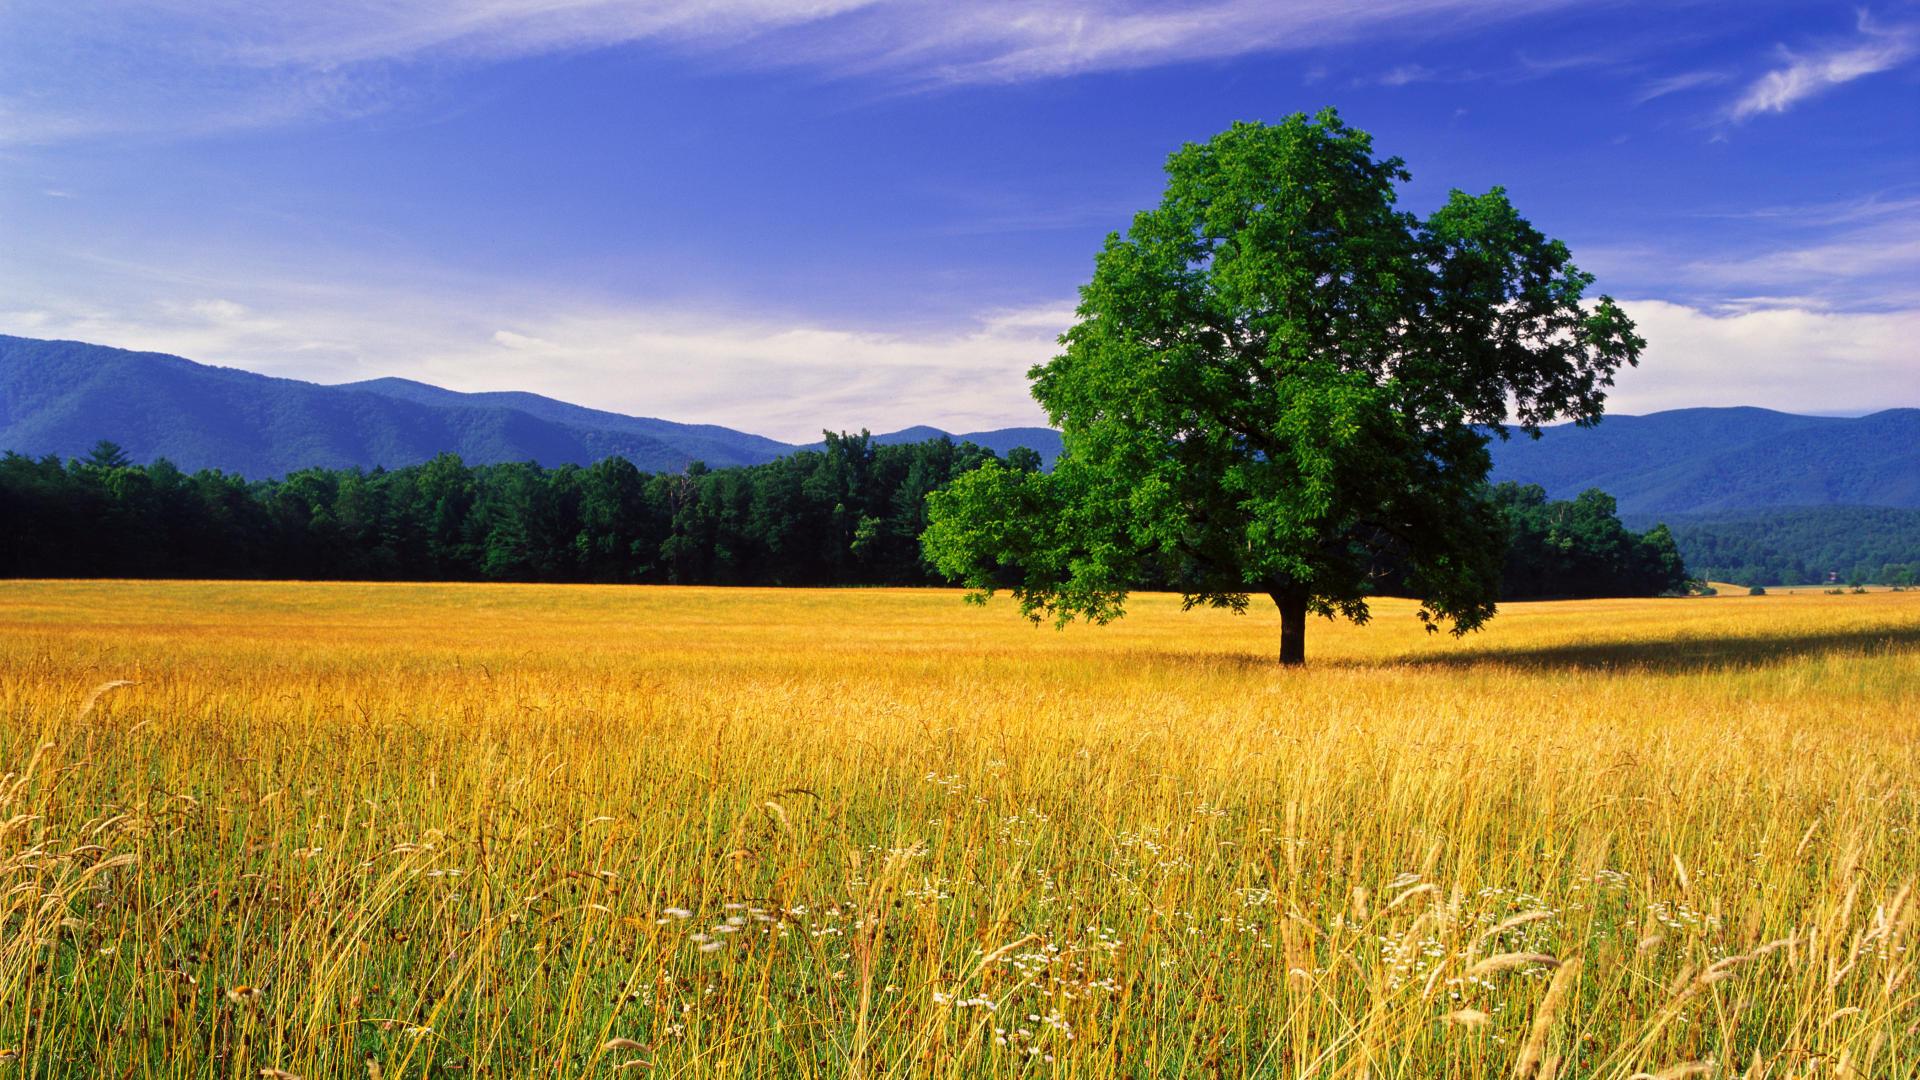 nature landscape beautiful images top desktop nature hd wallpapers 1920x1080